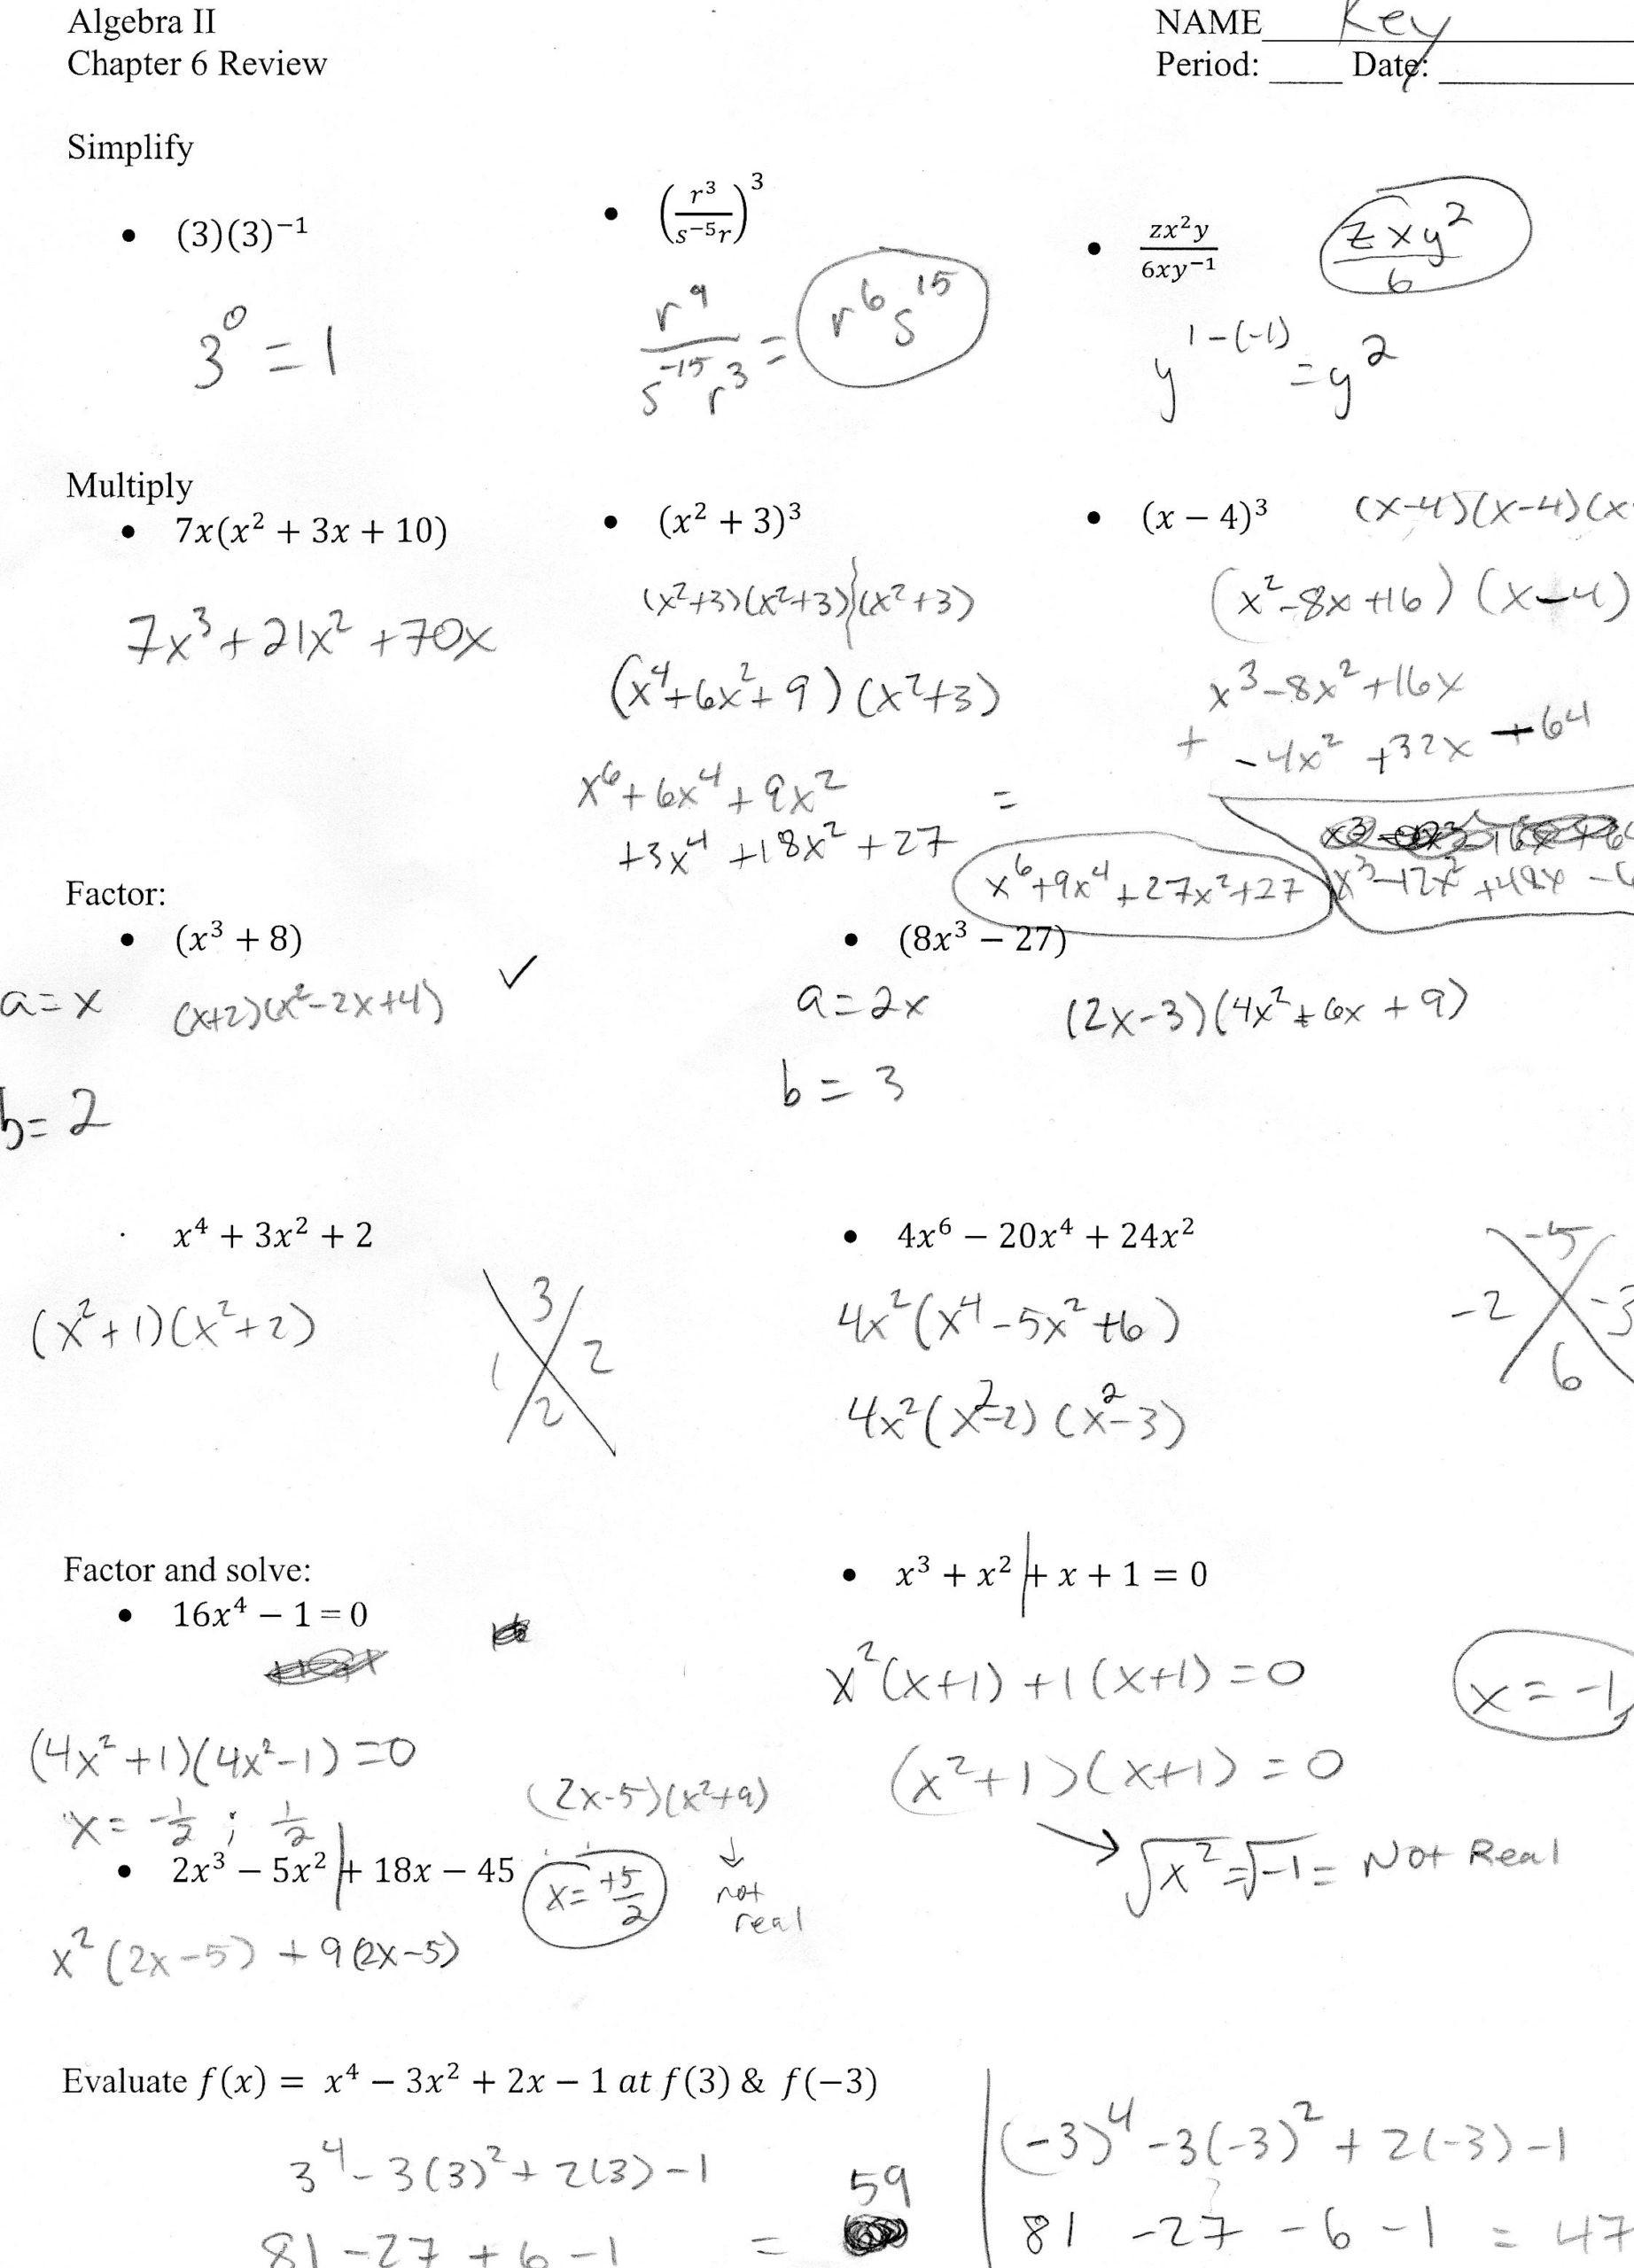 Algebra 1 Review Worksheet 1st Grade Printable Activities Free 2nd Grade Math